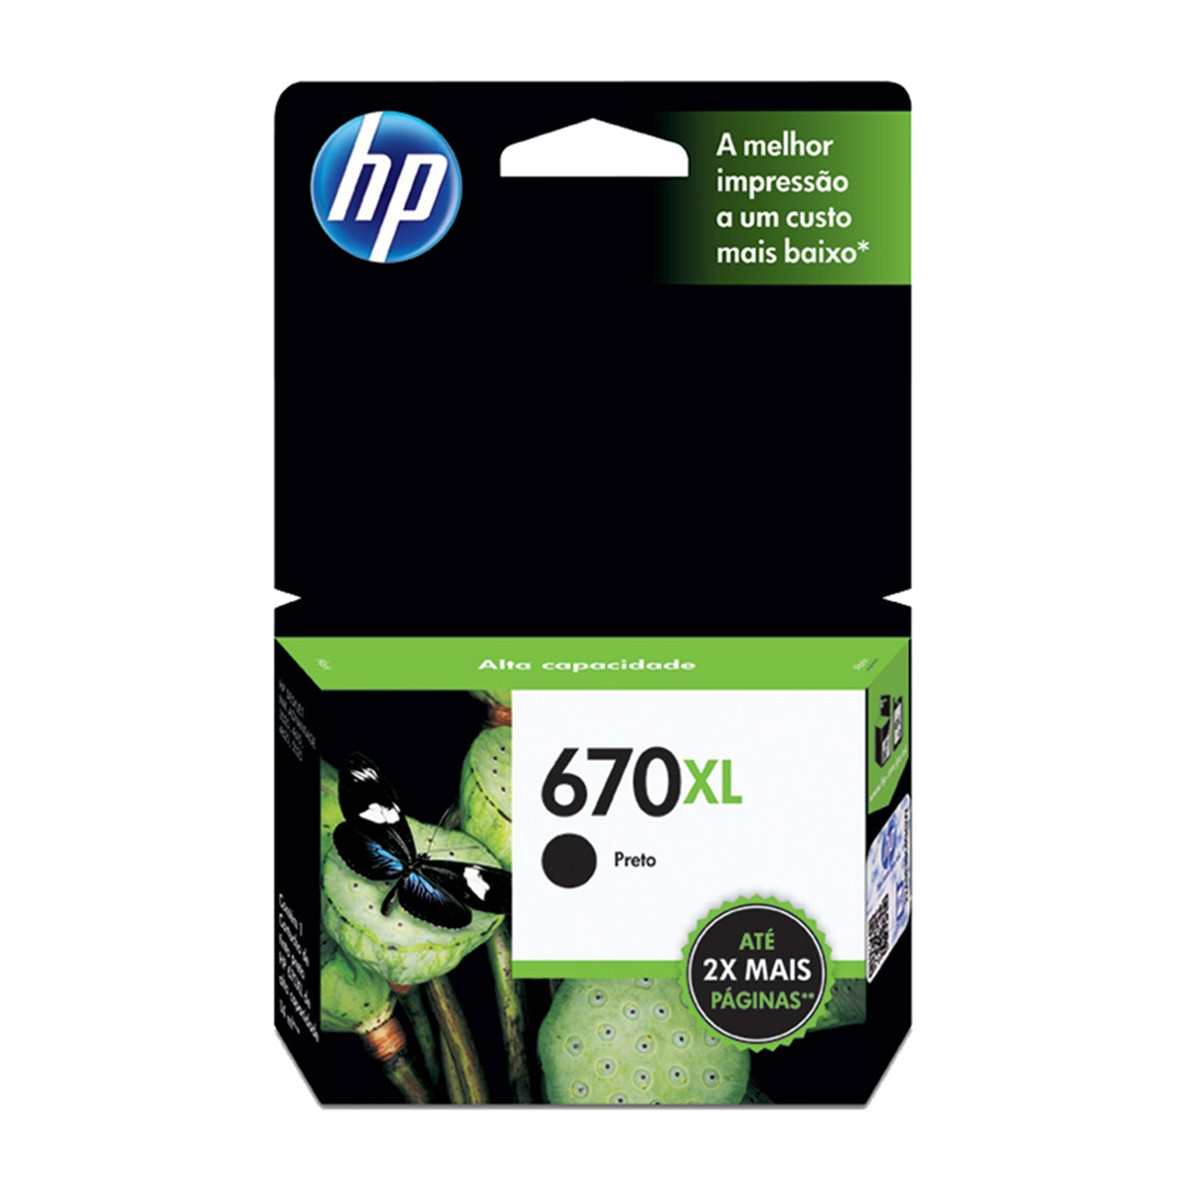 Cartucho de Tinta HP 670XL CZ117AB | Preto | Original HP | 14 ml